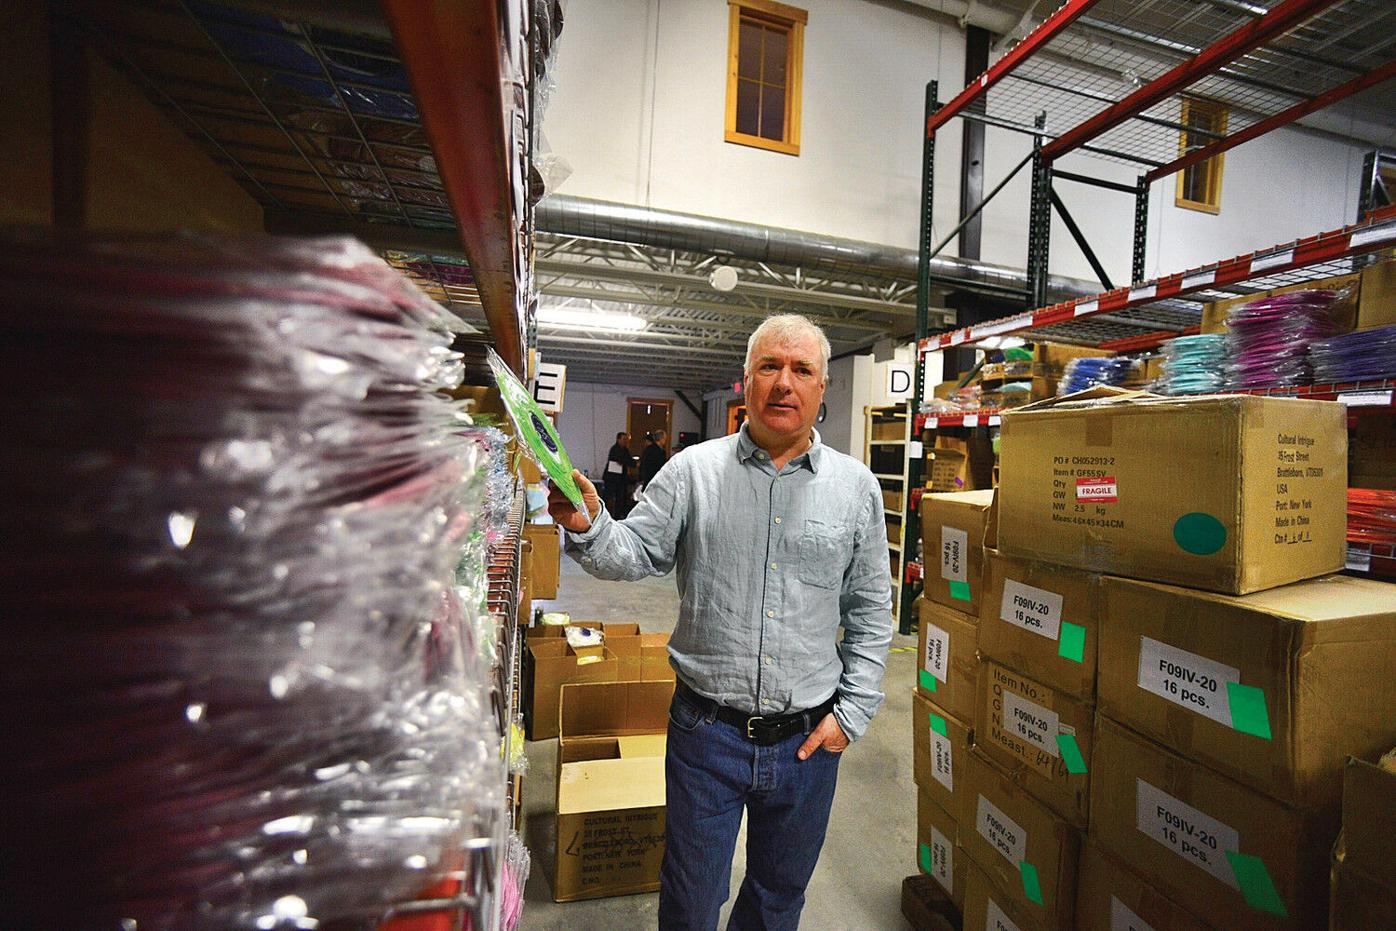 Mocha Joe's buys Cultural Intrigue warehouse for $1 million